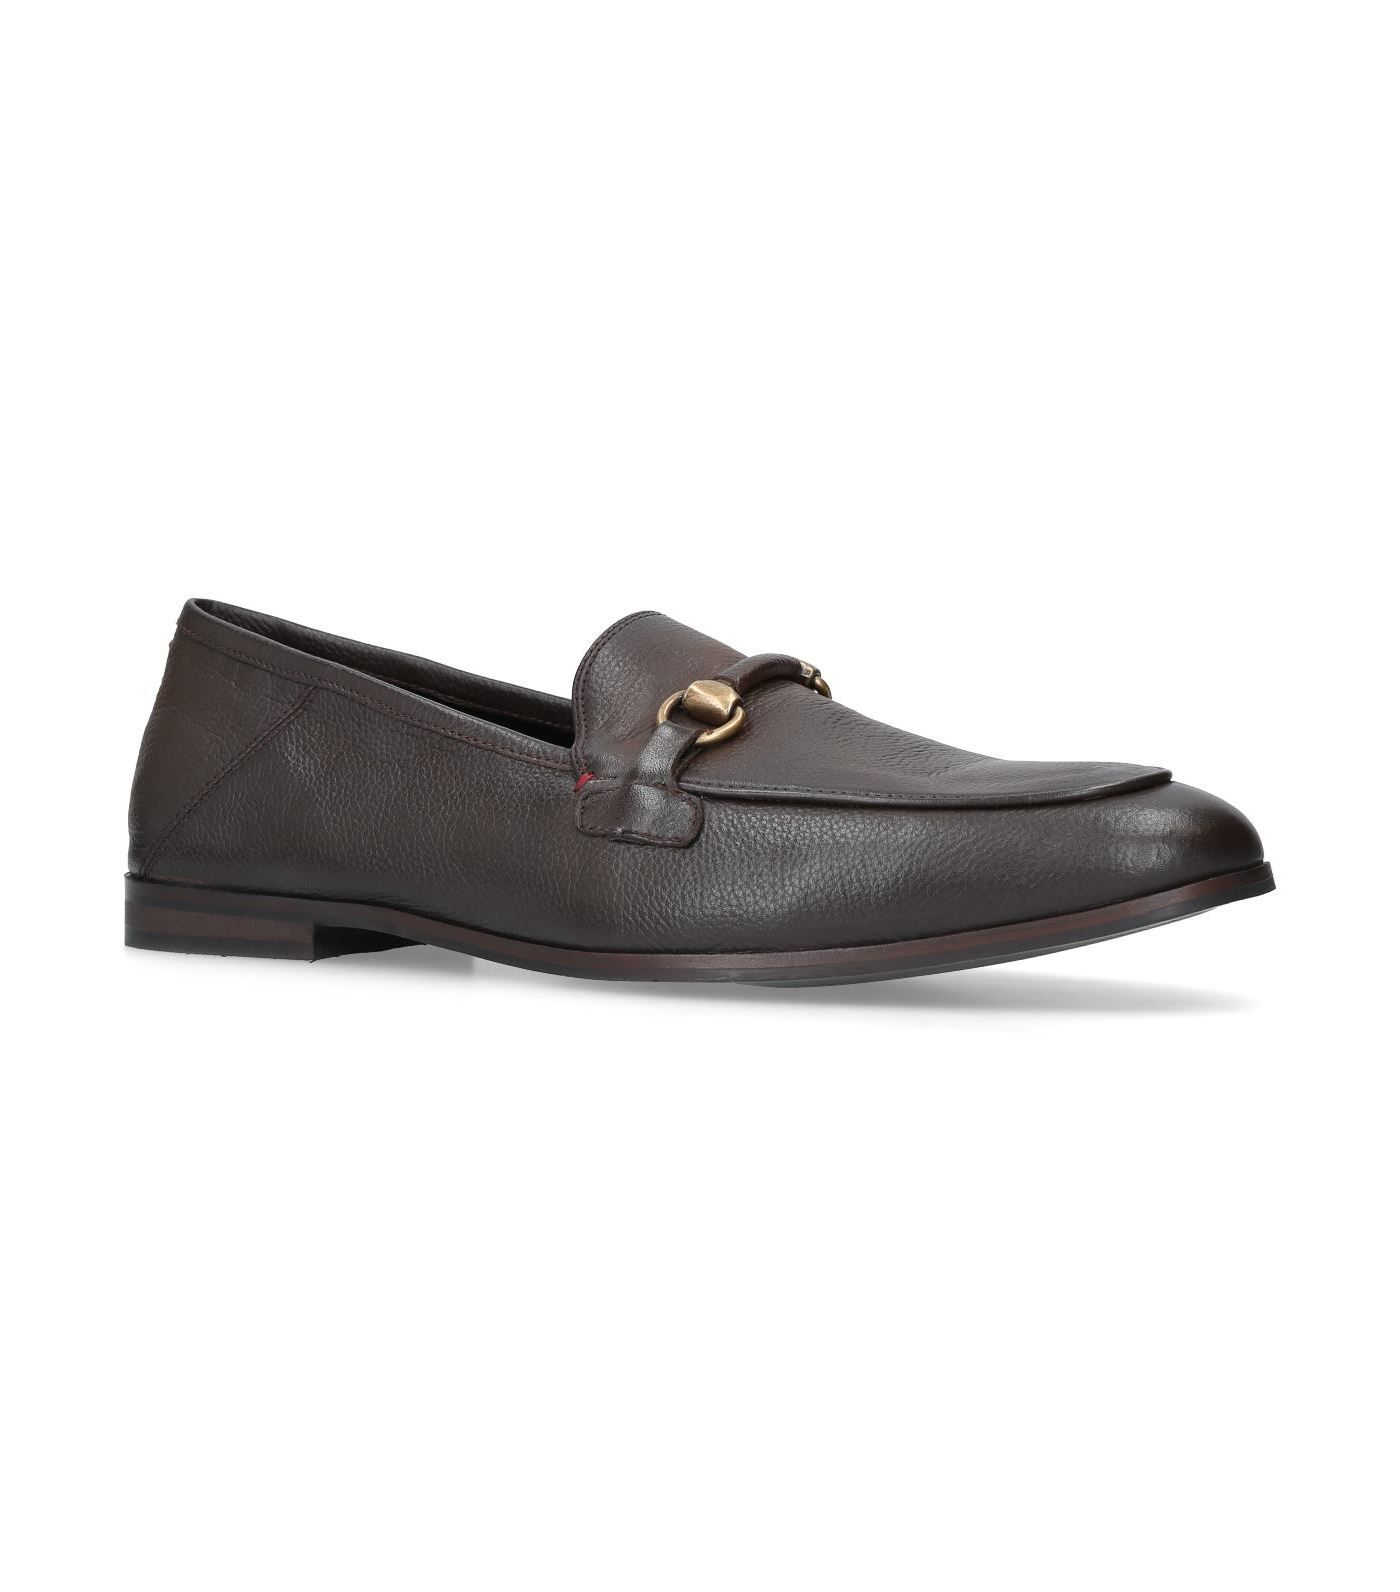 Latest Kurt Geiger London Black Lloyd Leather Loafers for Men Sale Online